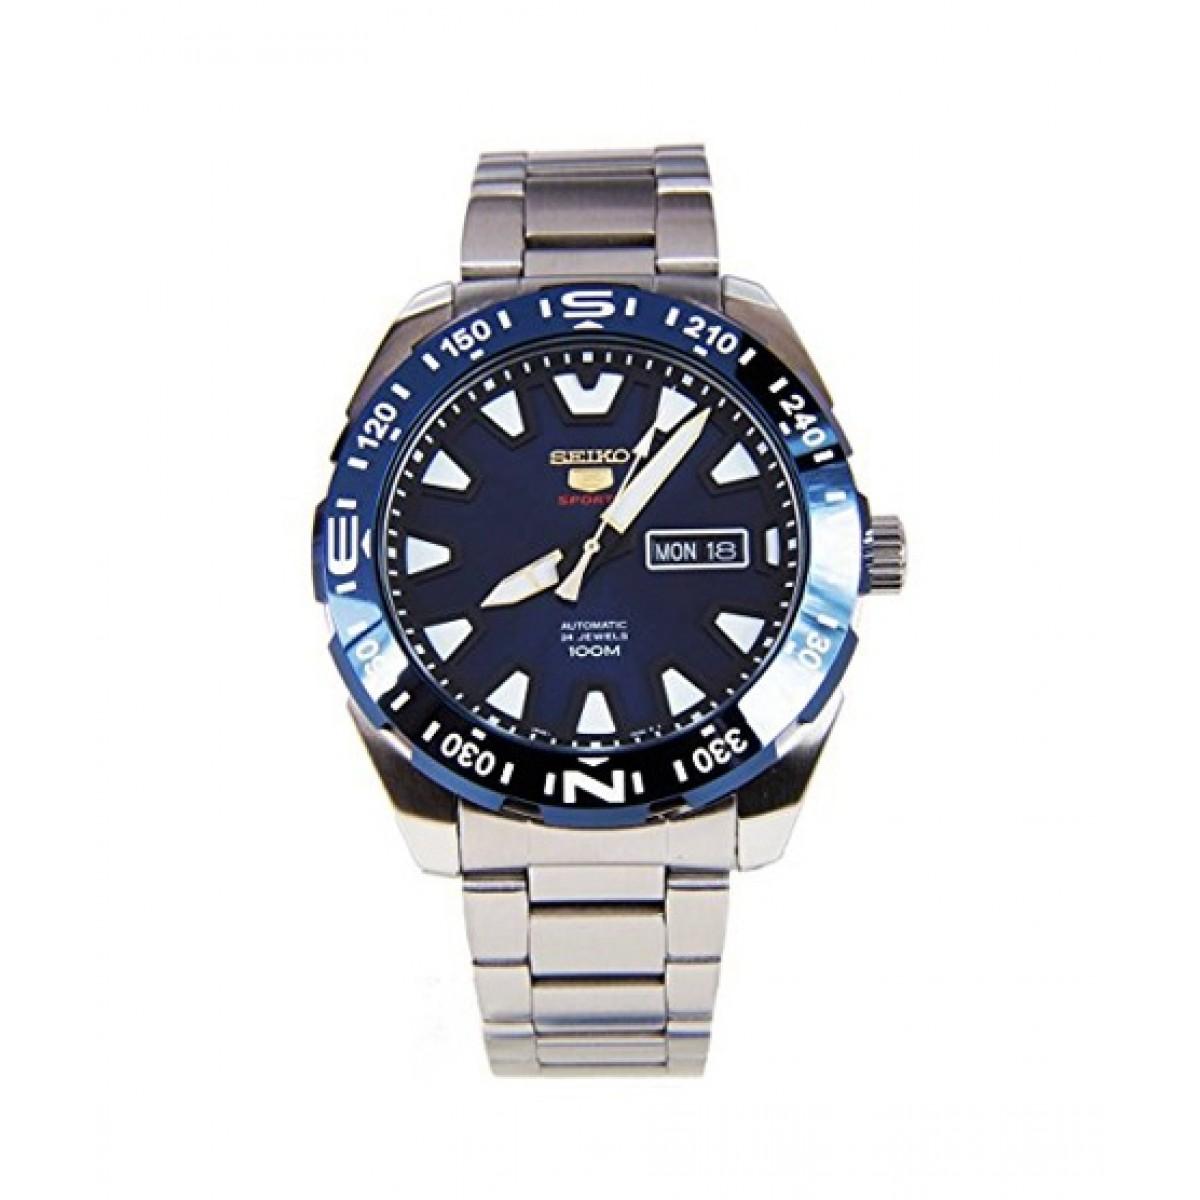 Seiko 5 Sports Men's Watch Price in Pakistan | Buy Seiko Men's Watch Silver  (SRP747) | iShopping.pk